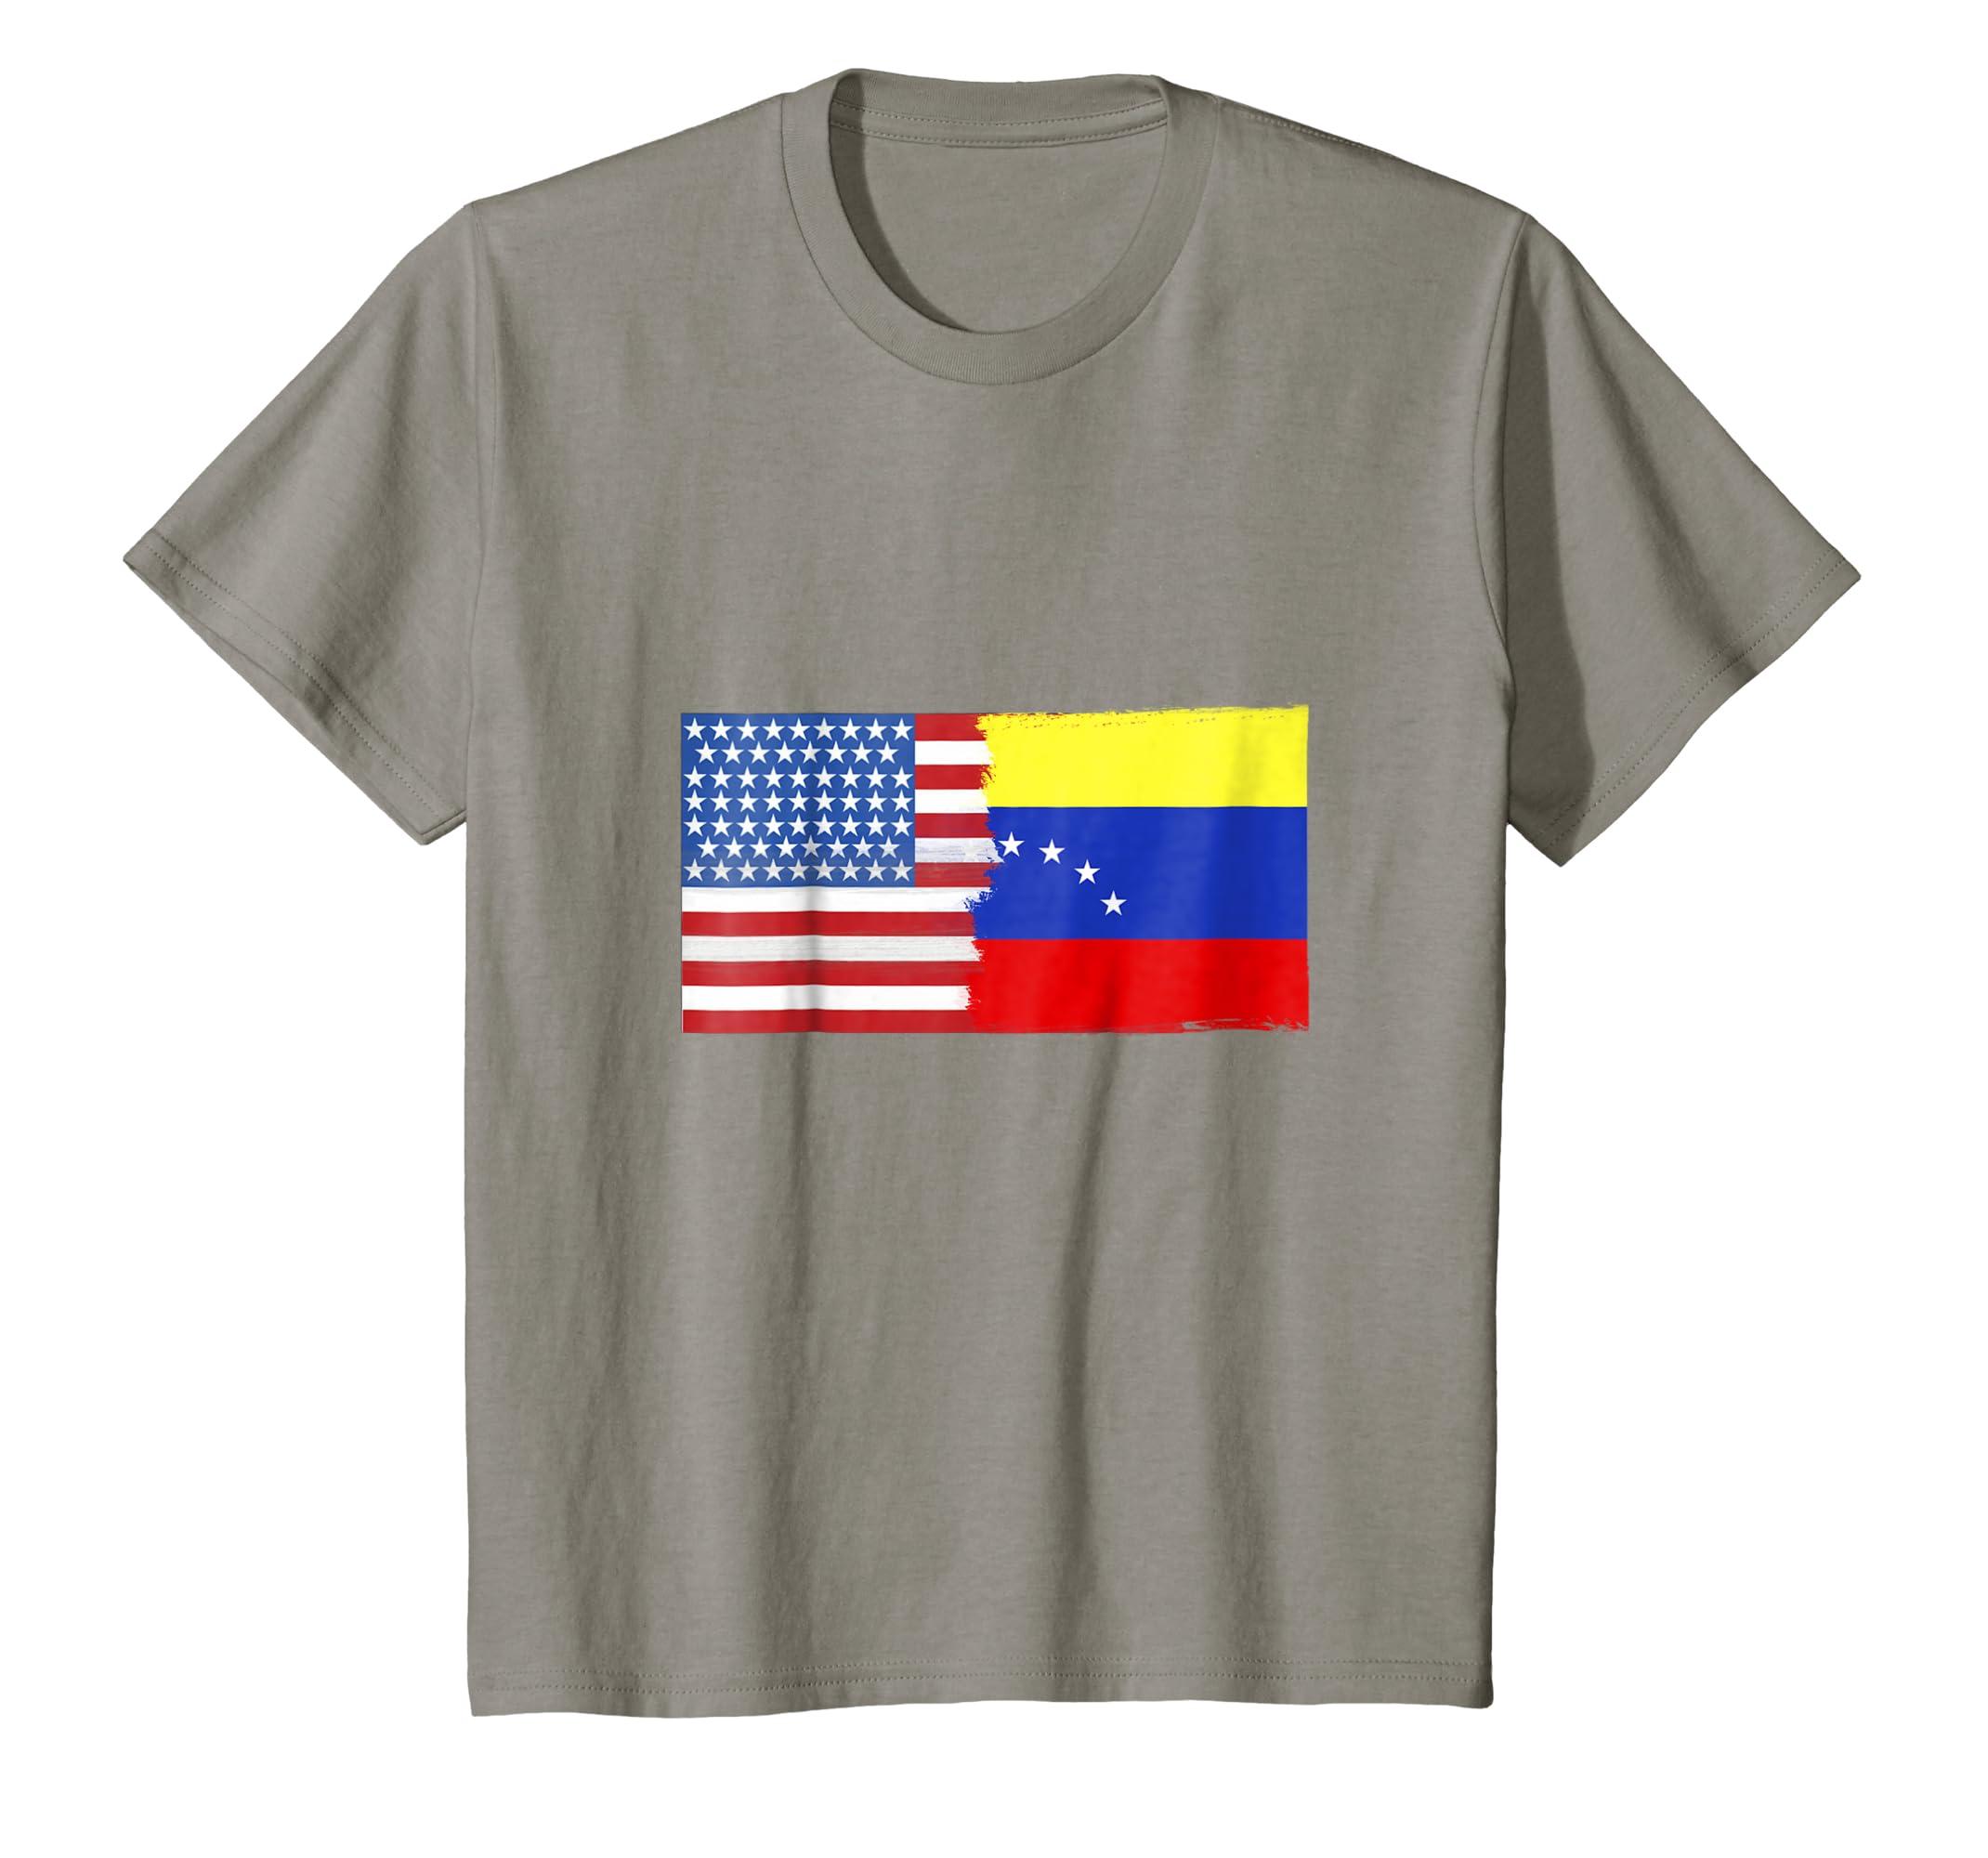 Amazon.com: Venezuelan American Half Venezuela Half America Flag Shirt: Clothing